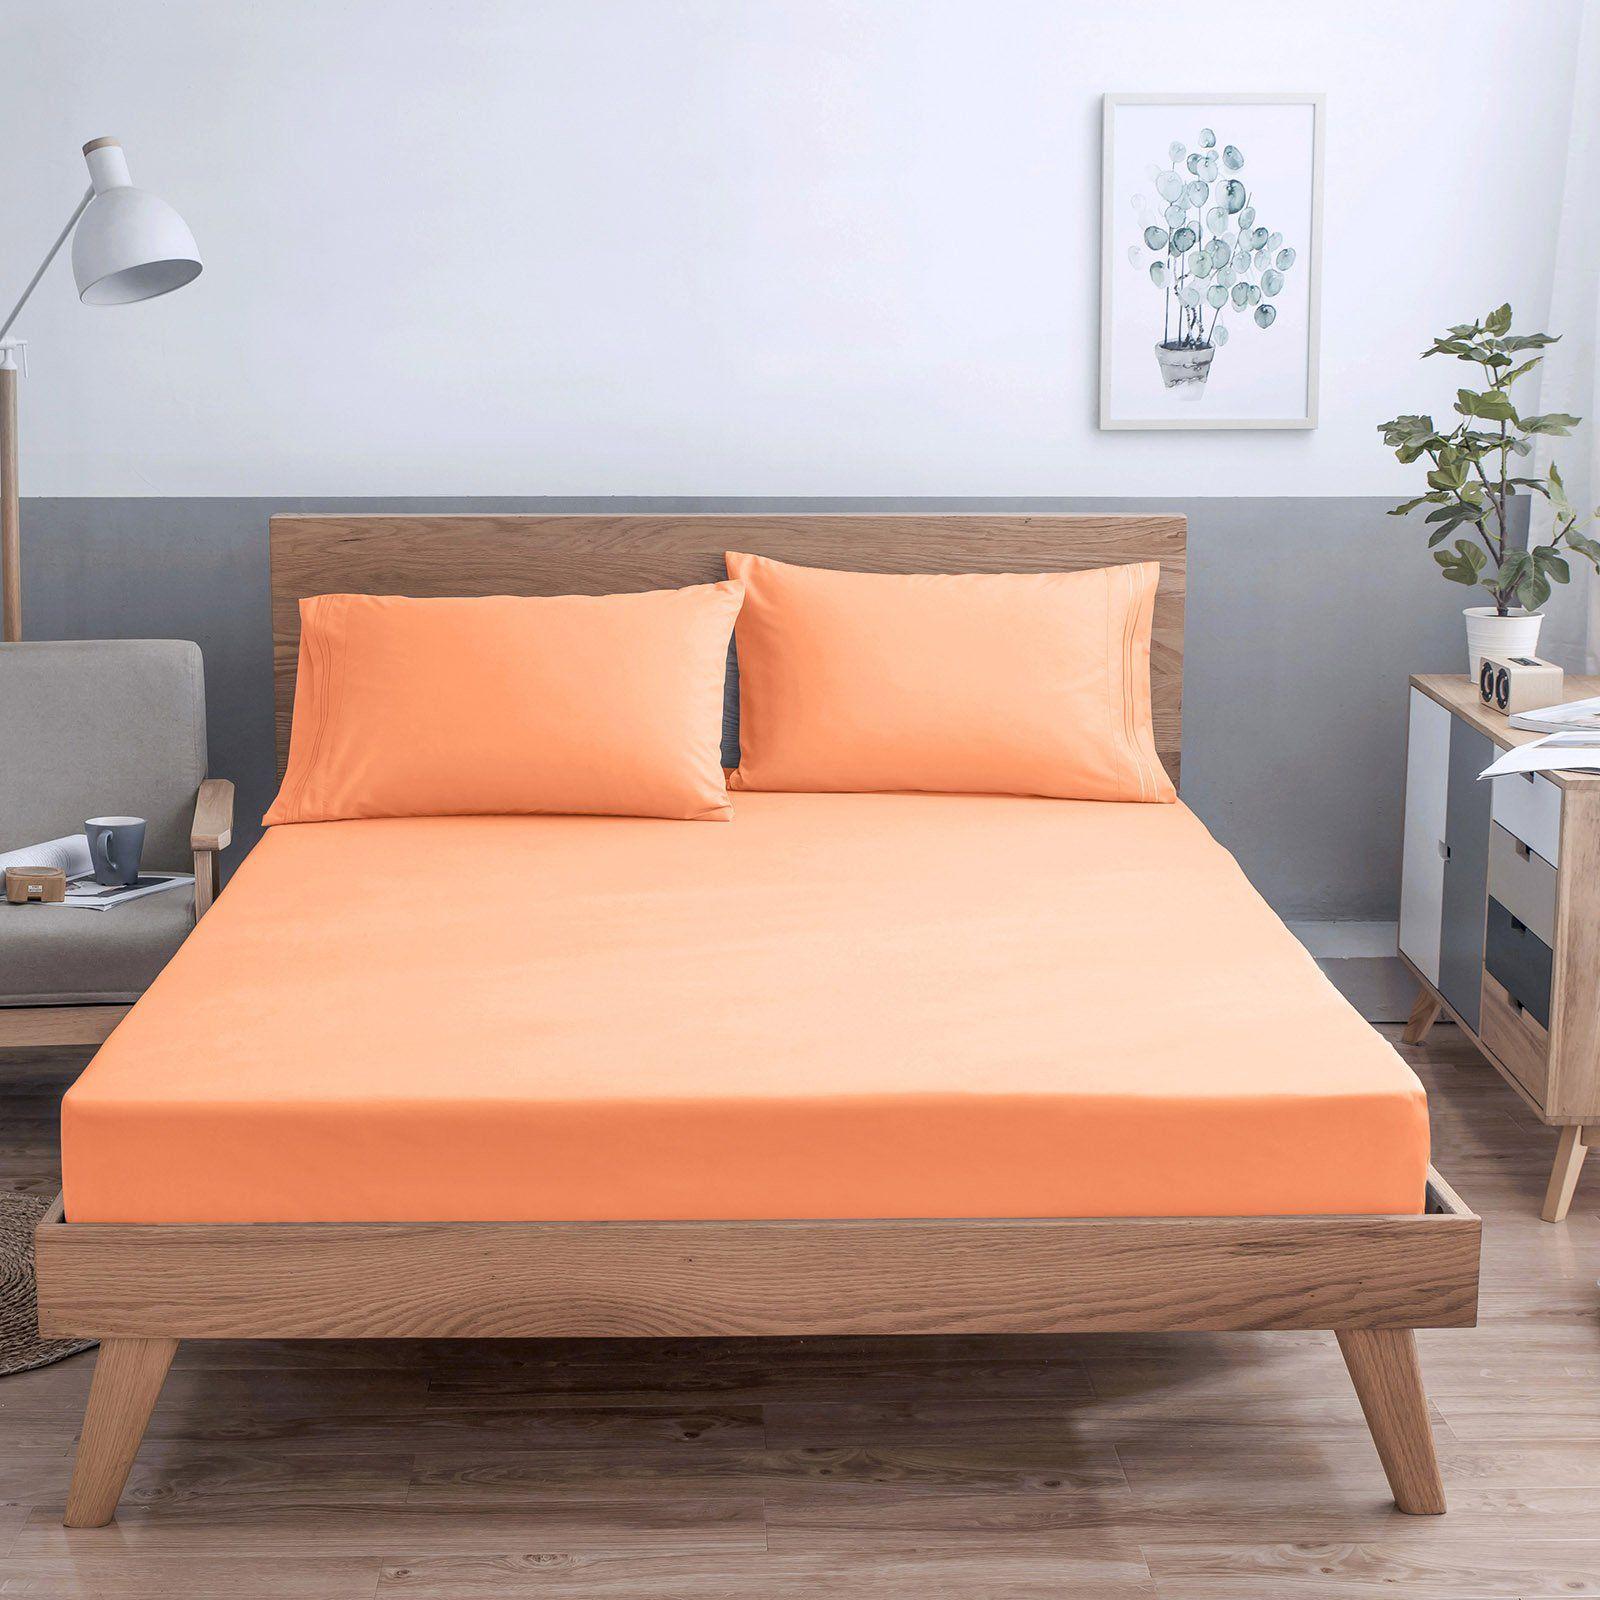 VEEYOO Bed Sheet Set Full Size Extra Soft 1800 Thread